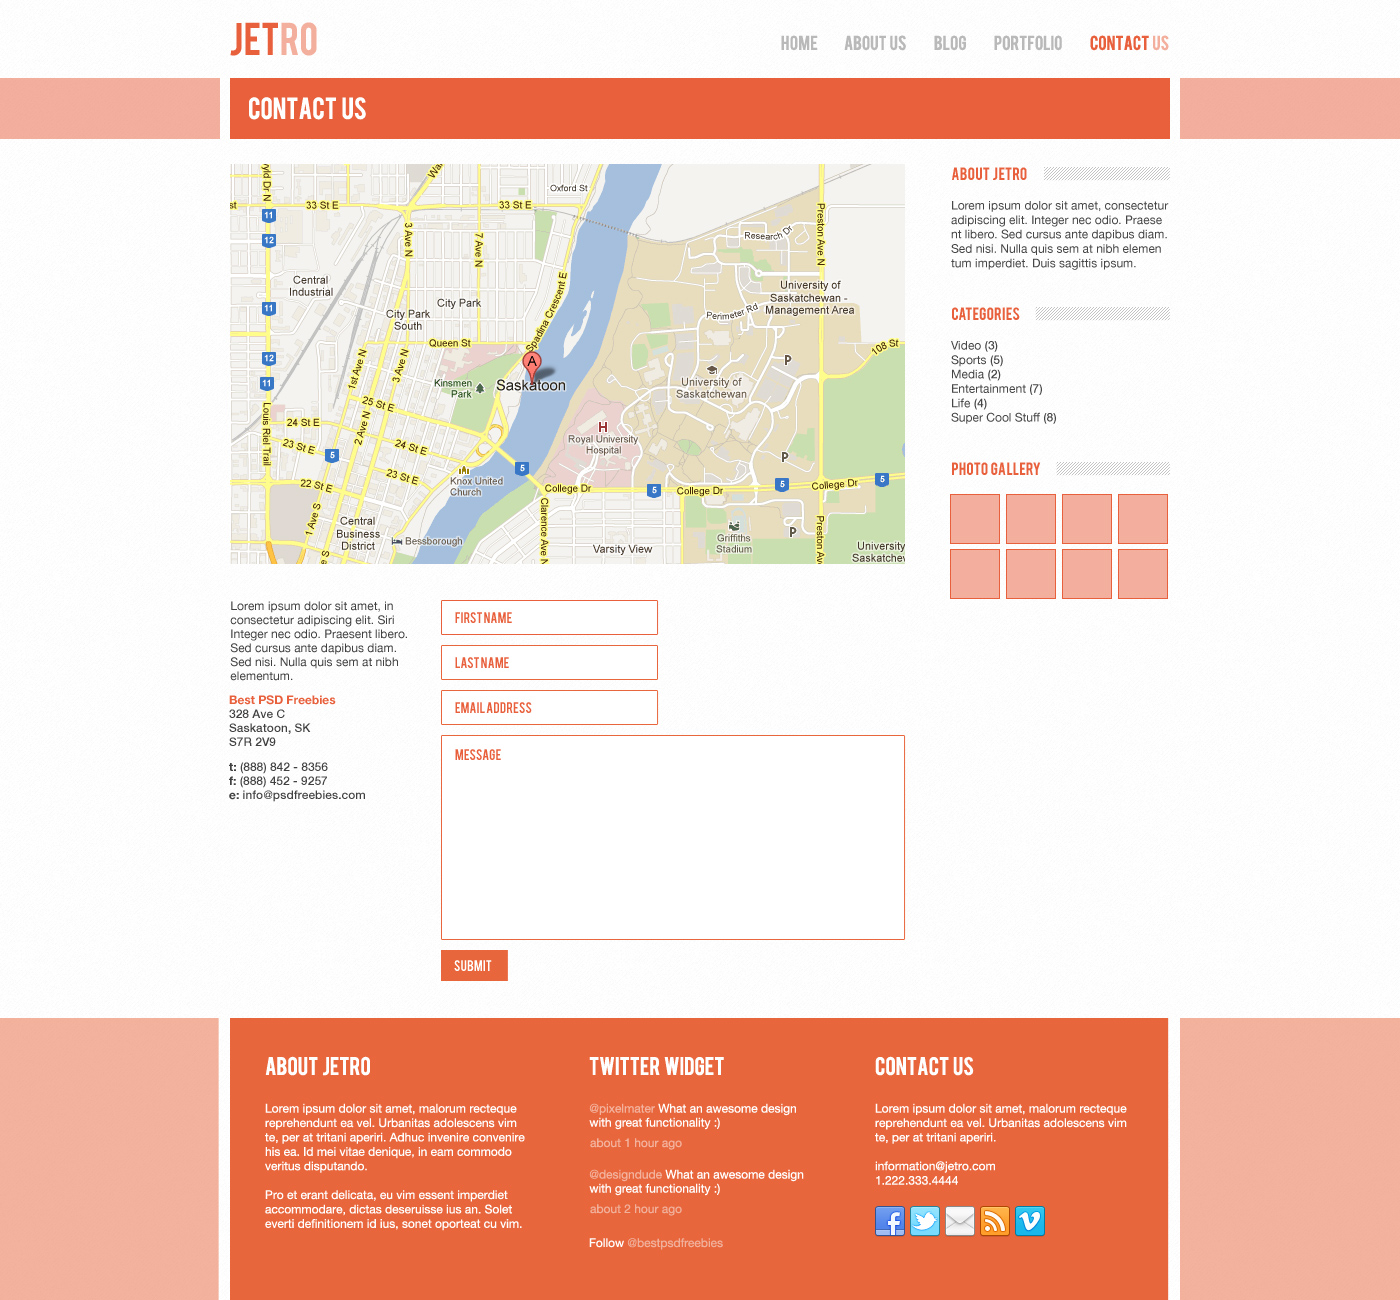 jetro-psd-responsive-html-template-contact